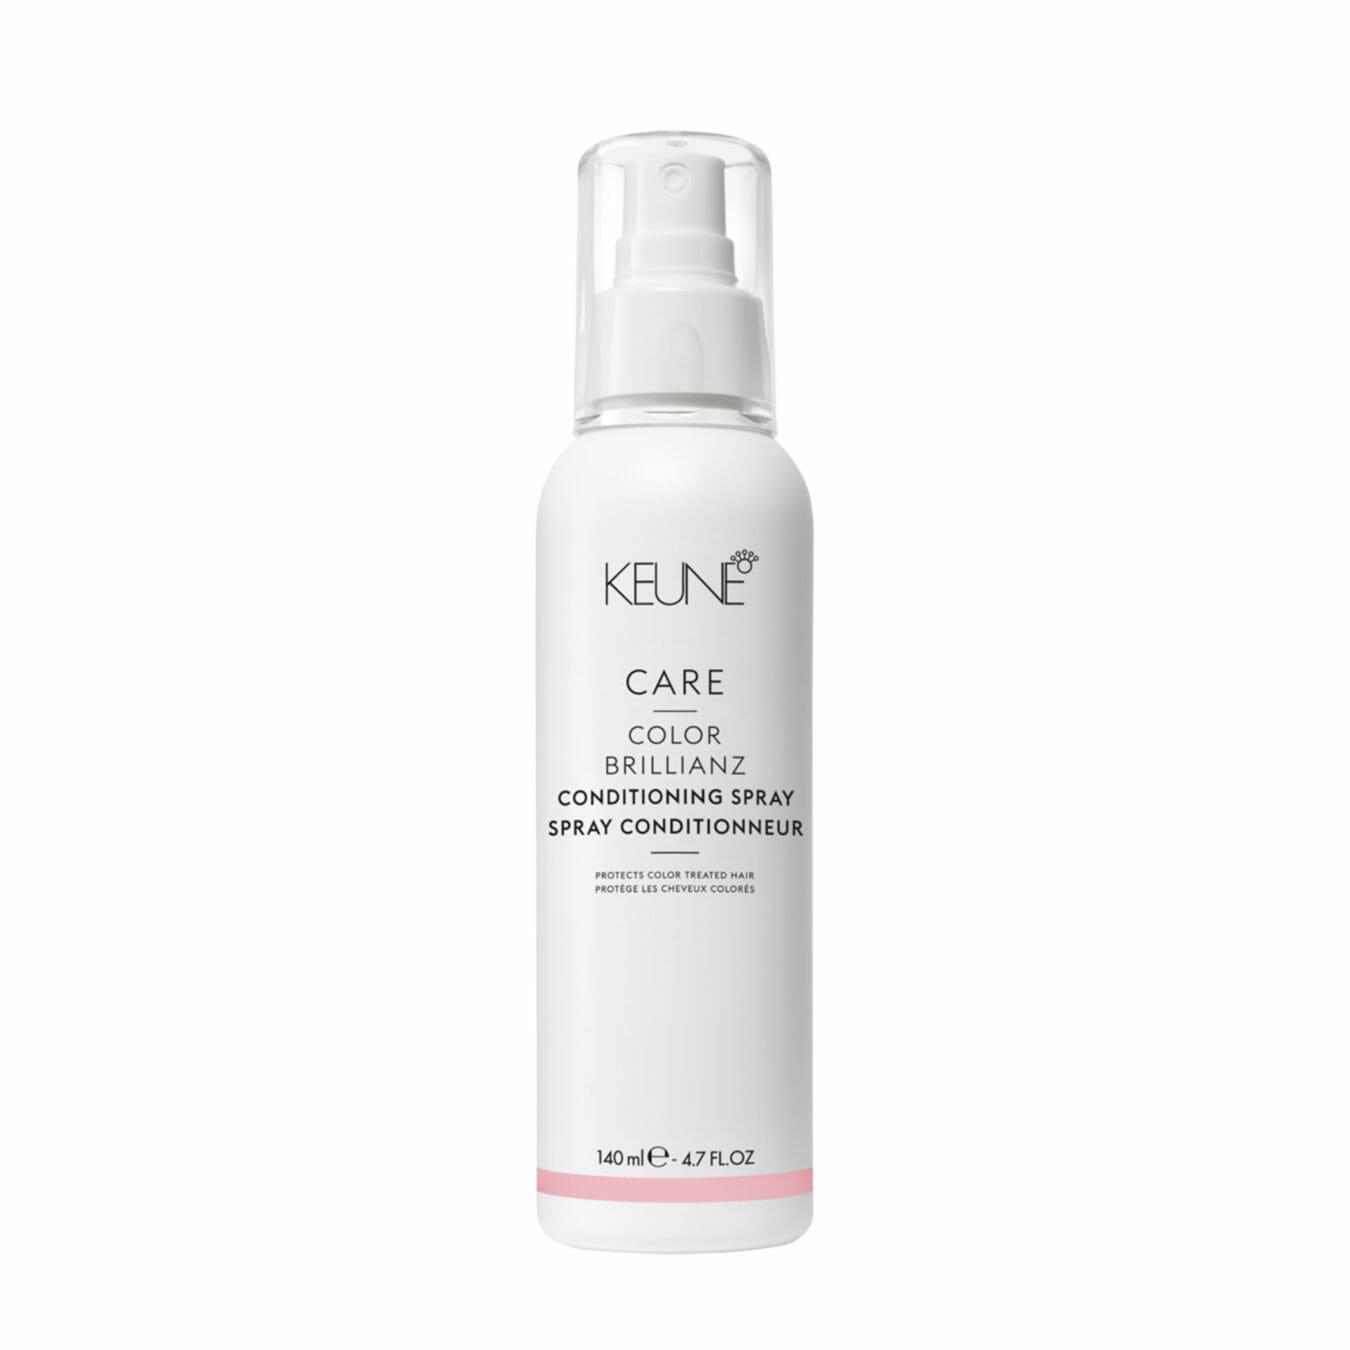 Kauf Keune Care Color Brillianz Conditioning Spray 140ml